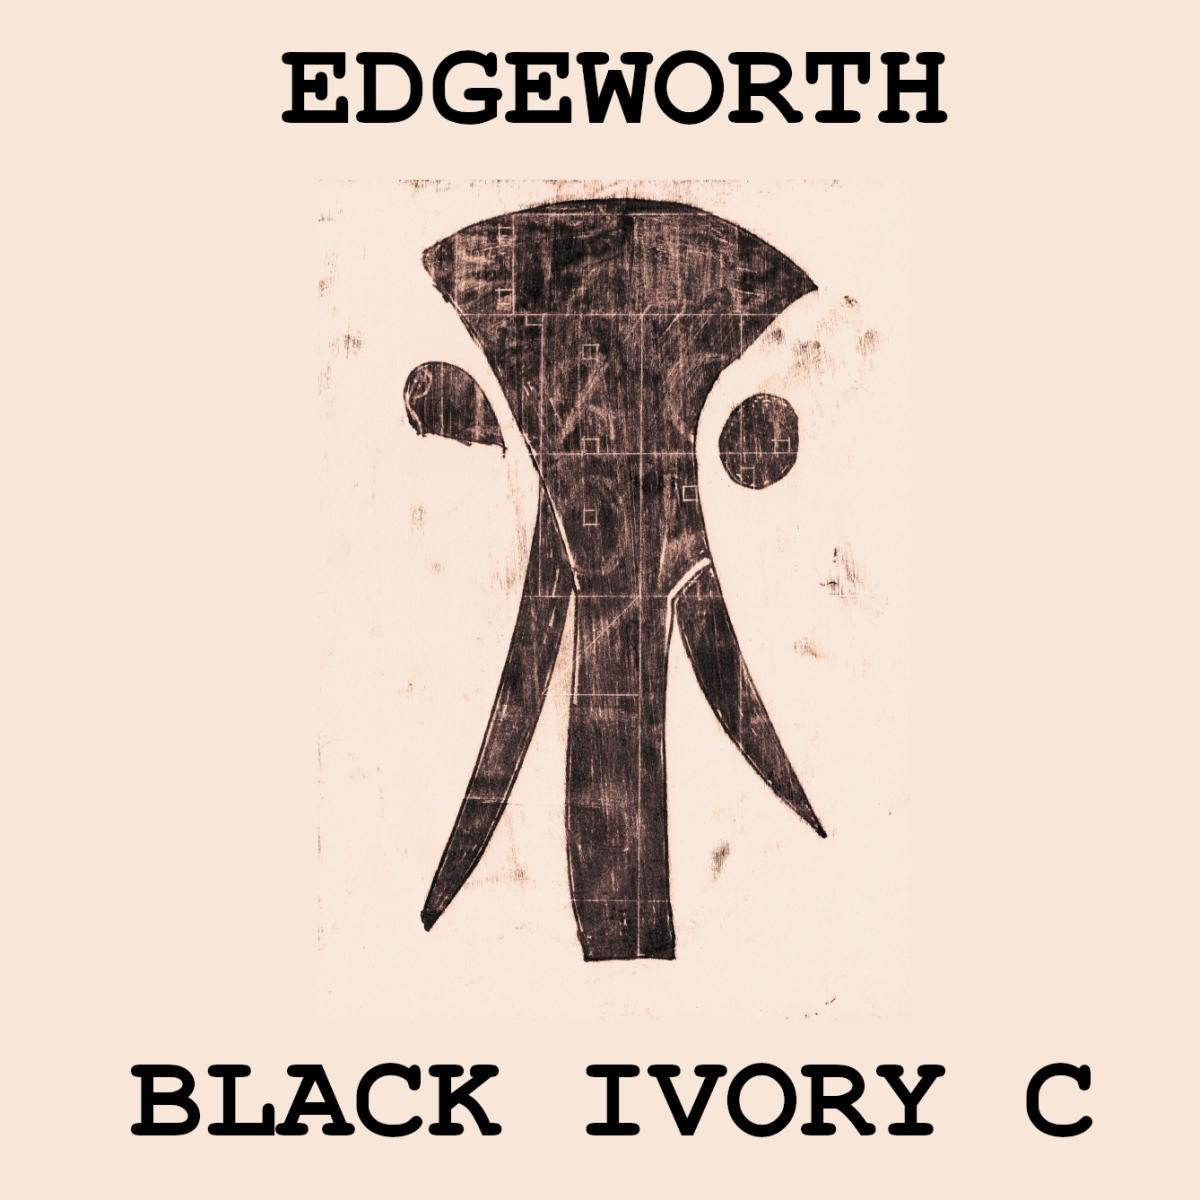 Black Ivory C